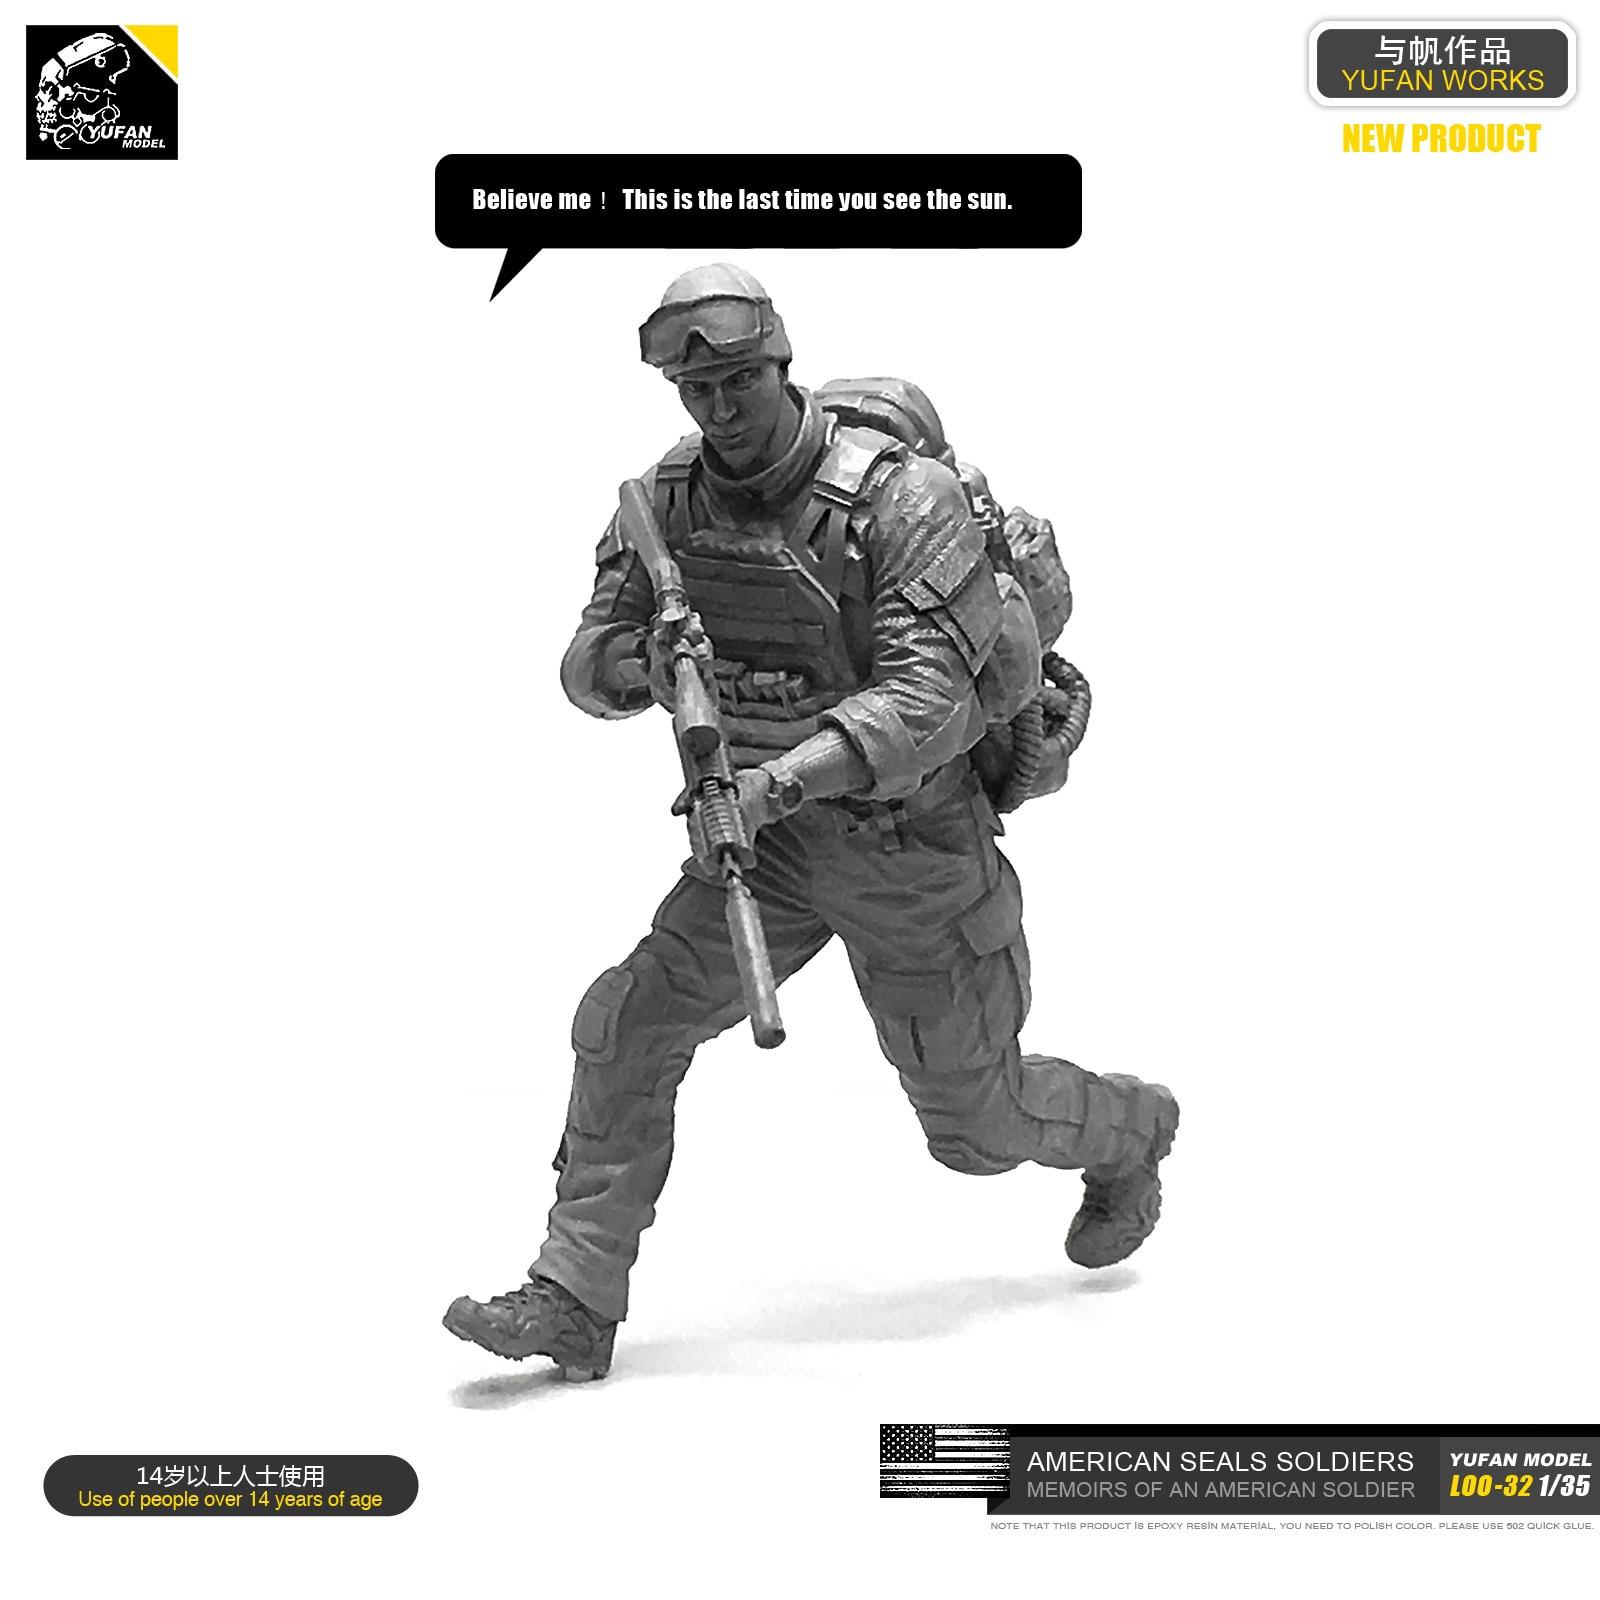 1/35 Resin Kits Figure US Navy Seal Commander Resin Soldier Sefl-assembled LOO-32